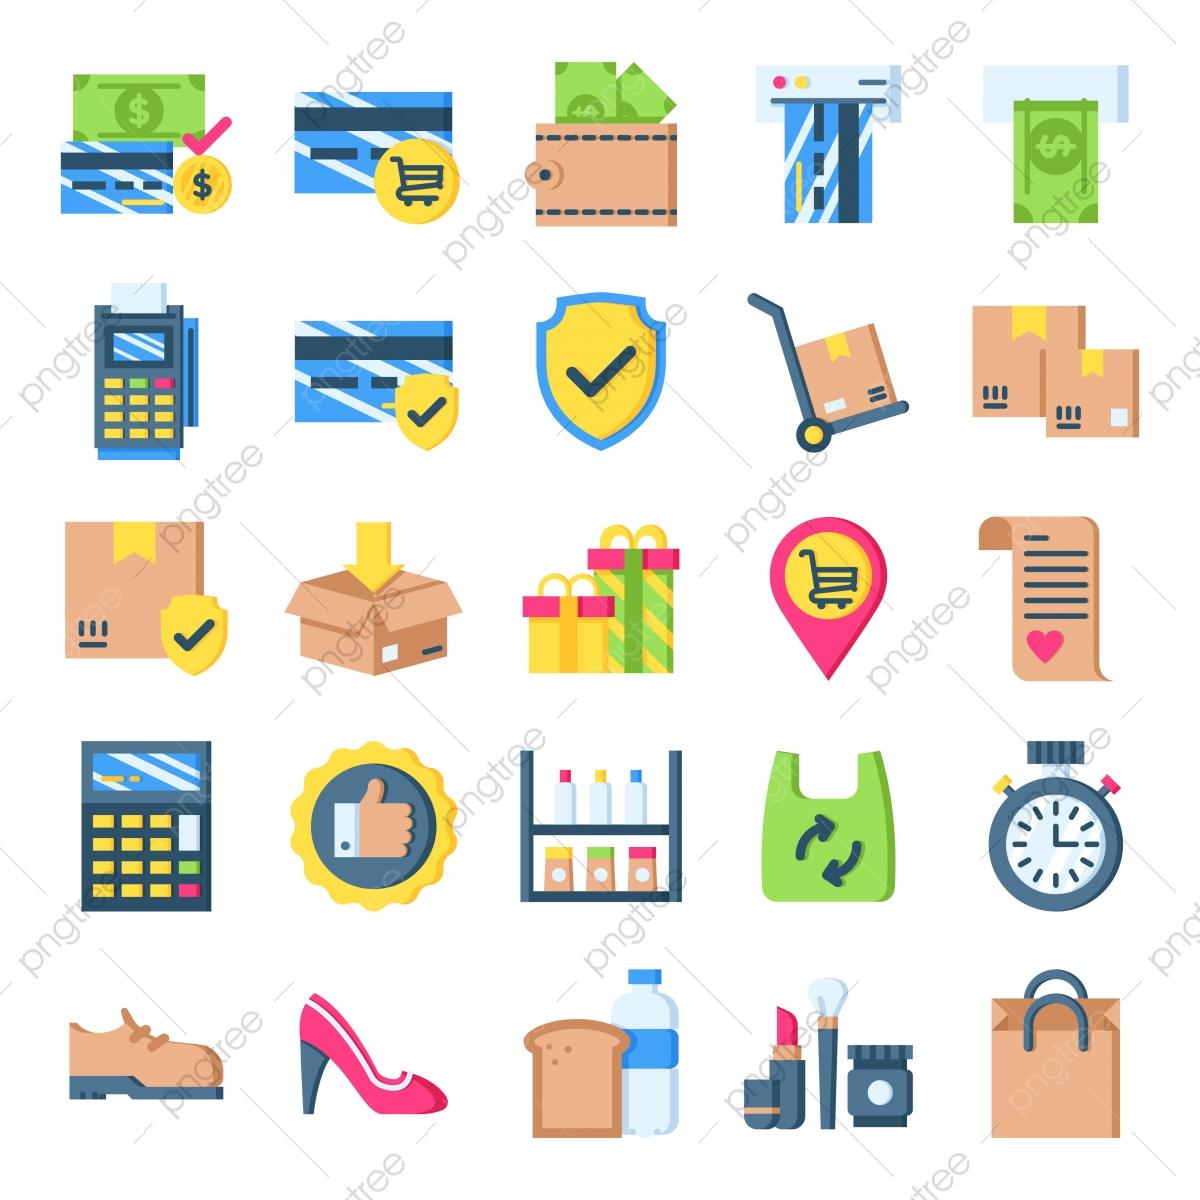 Retail Icons Pack, Bag, Basket, Business PNG Transparent.